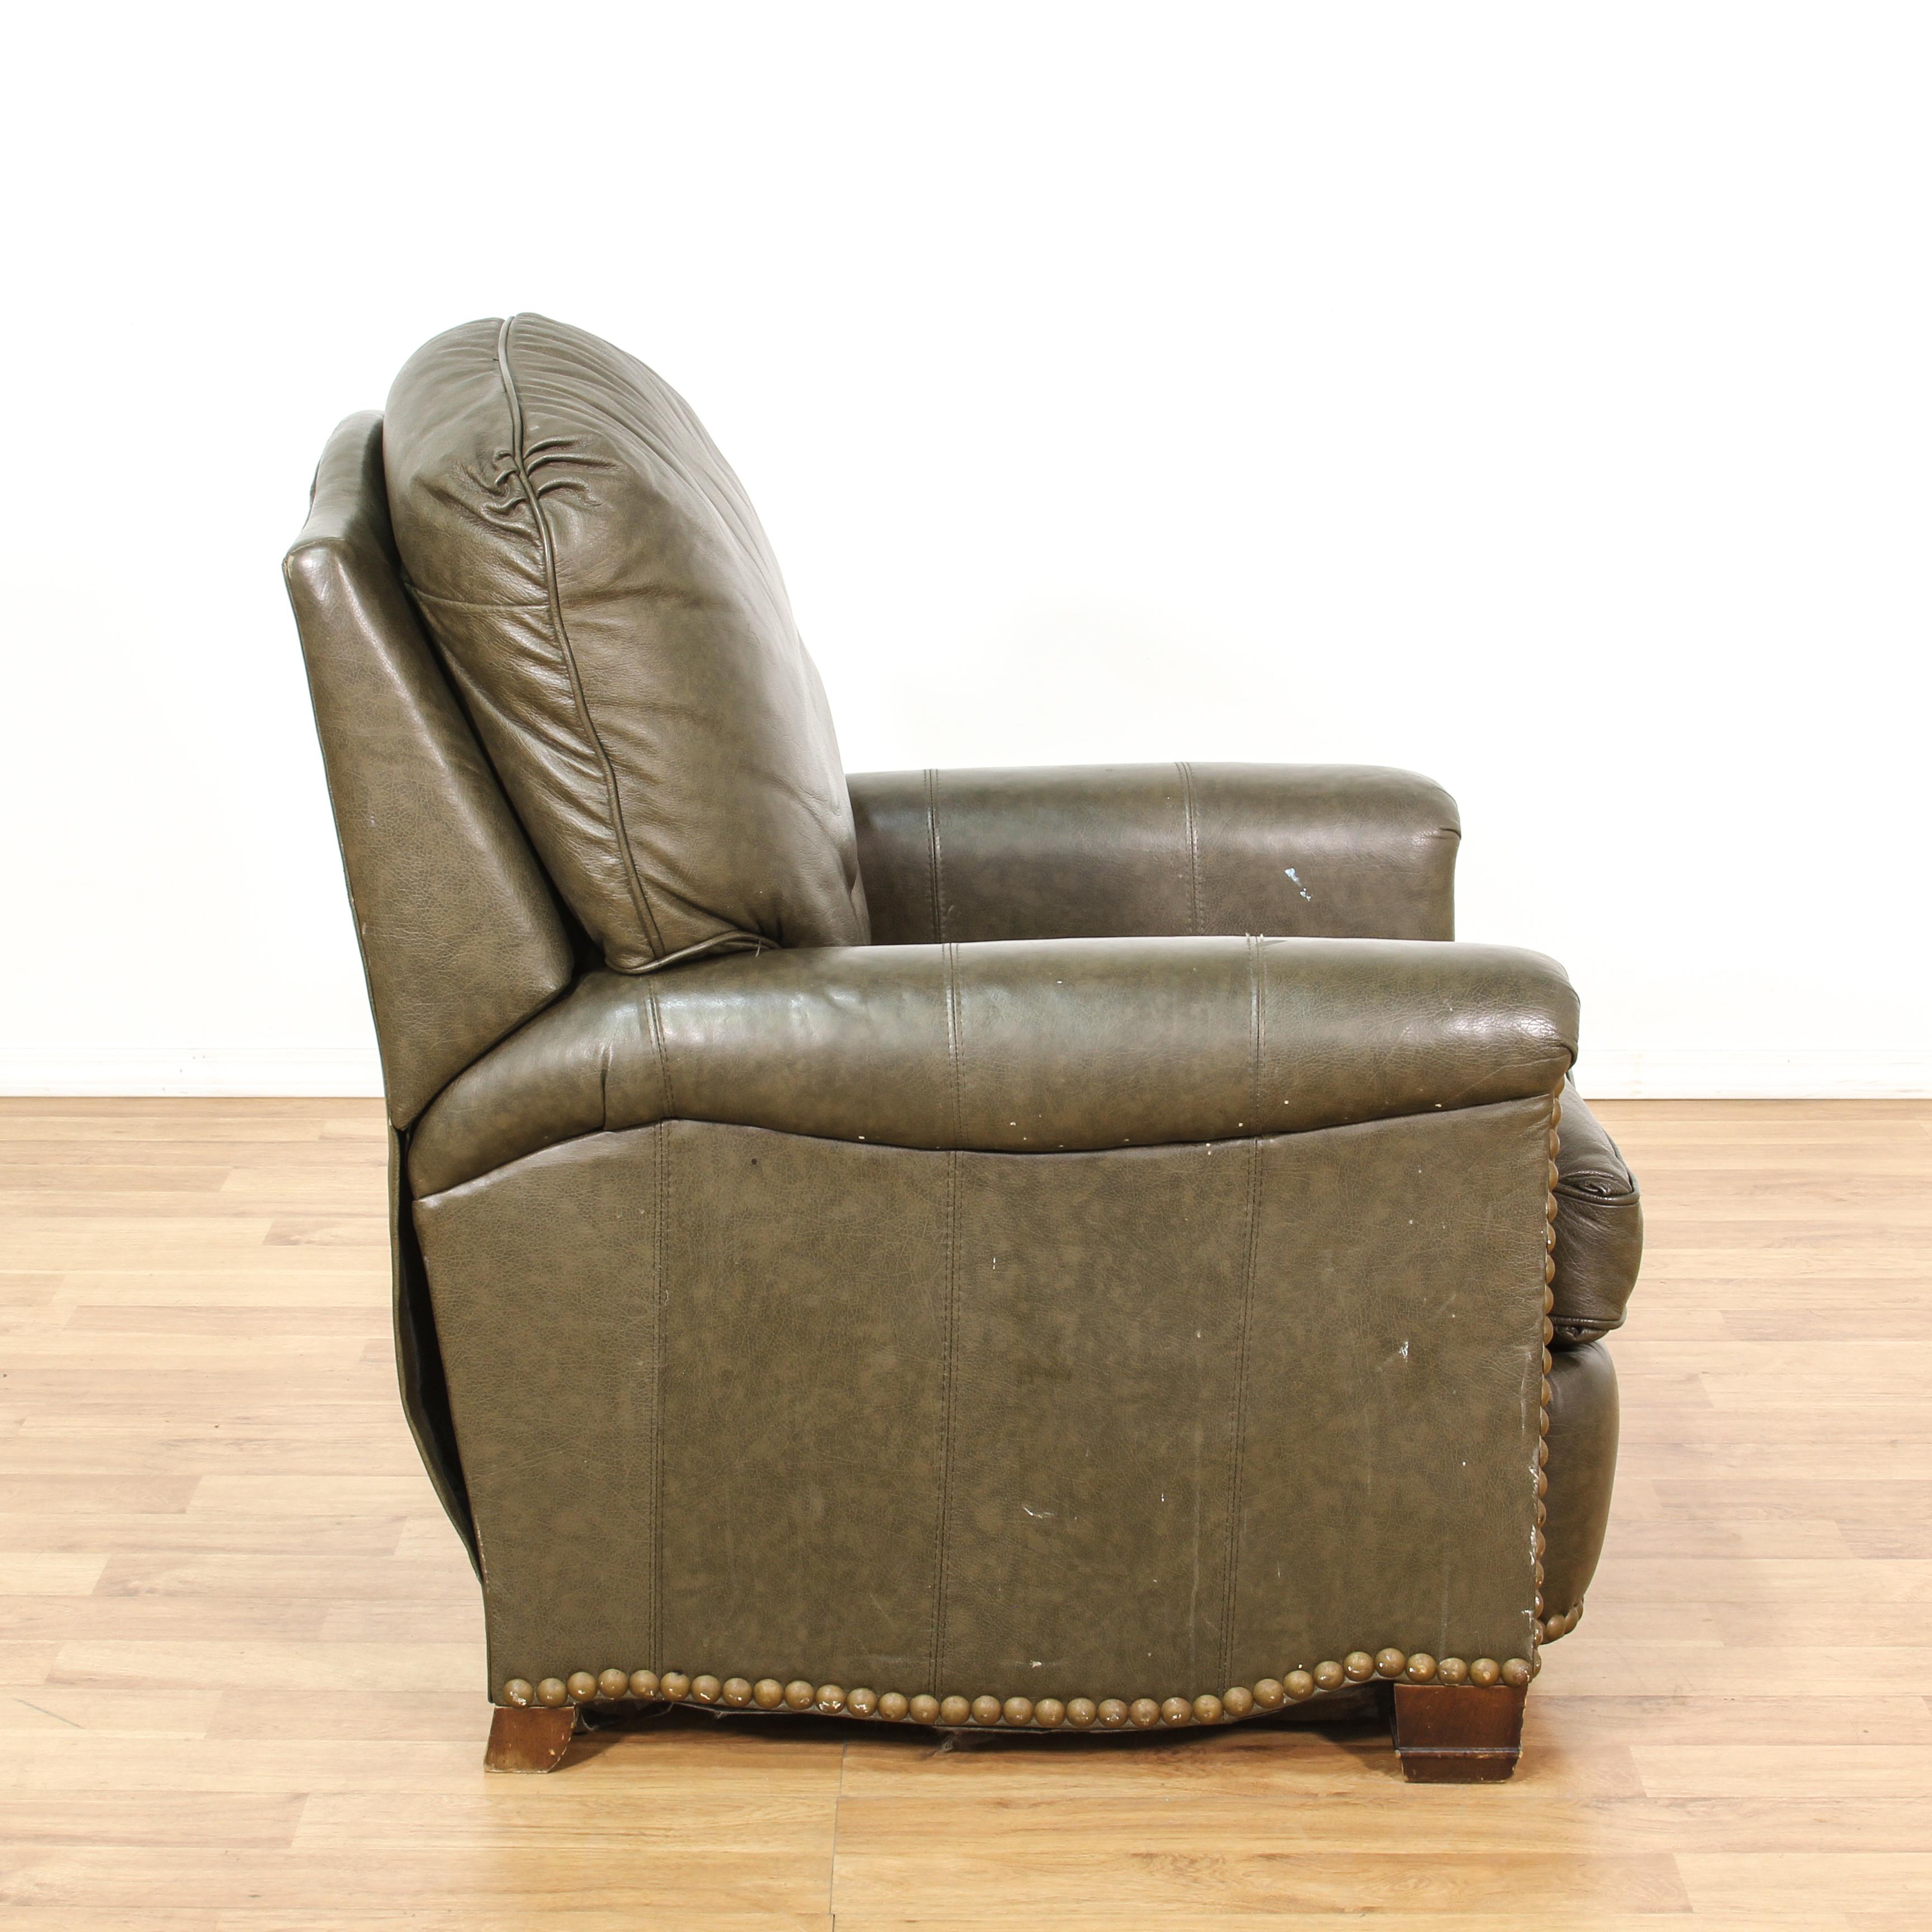 brown leather studded sofa comfort sleeper sale vinyl recliner chair loveseat